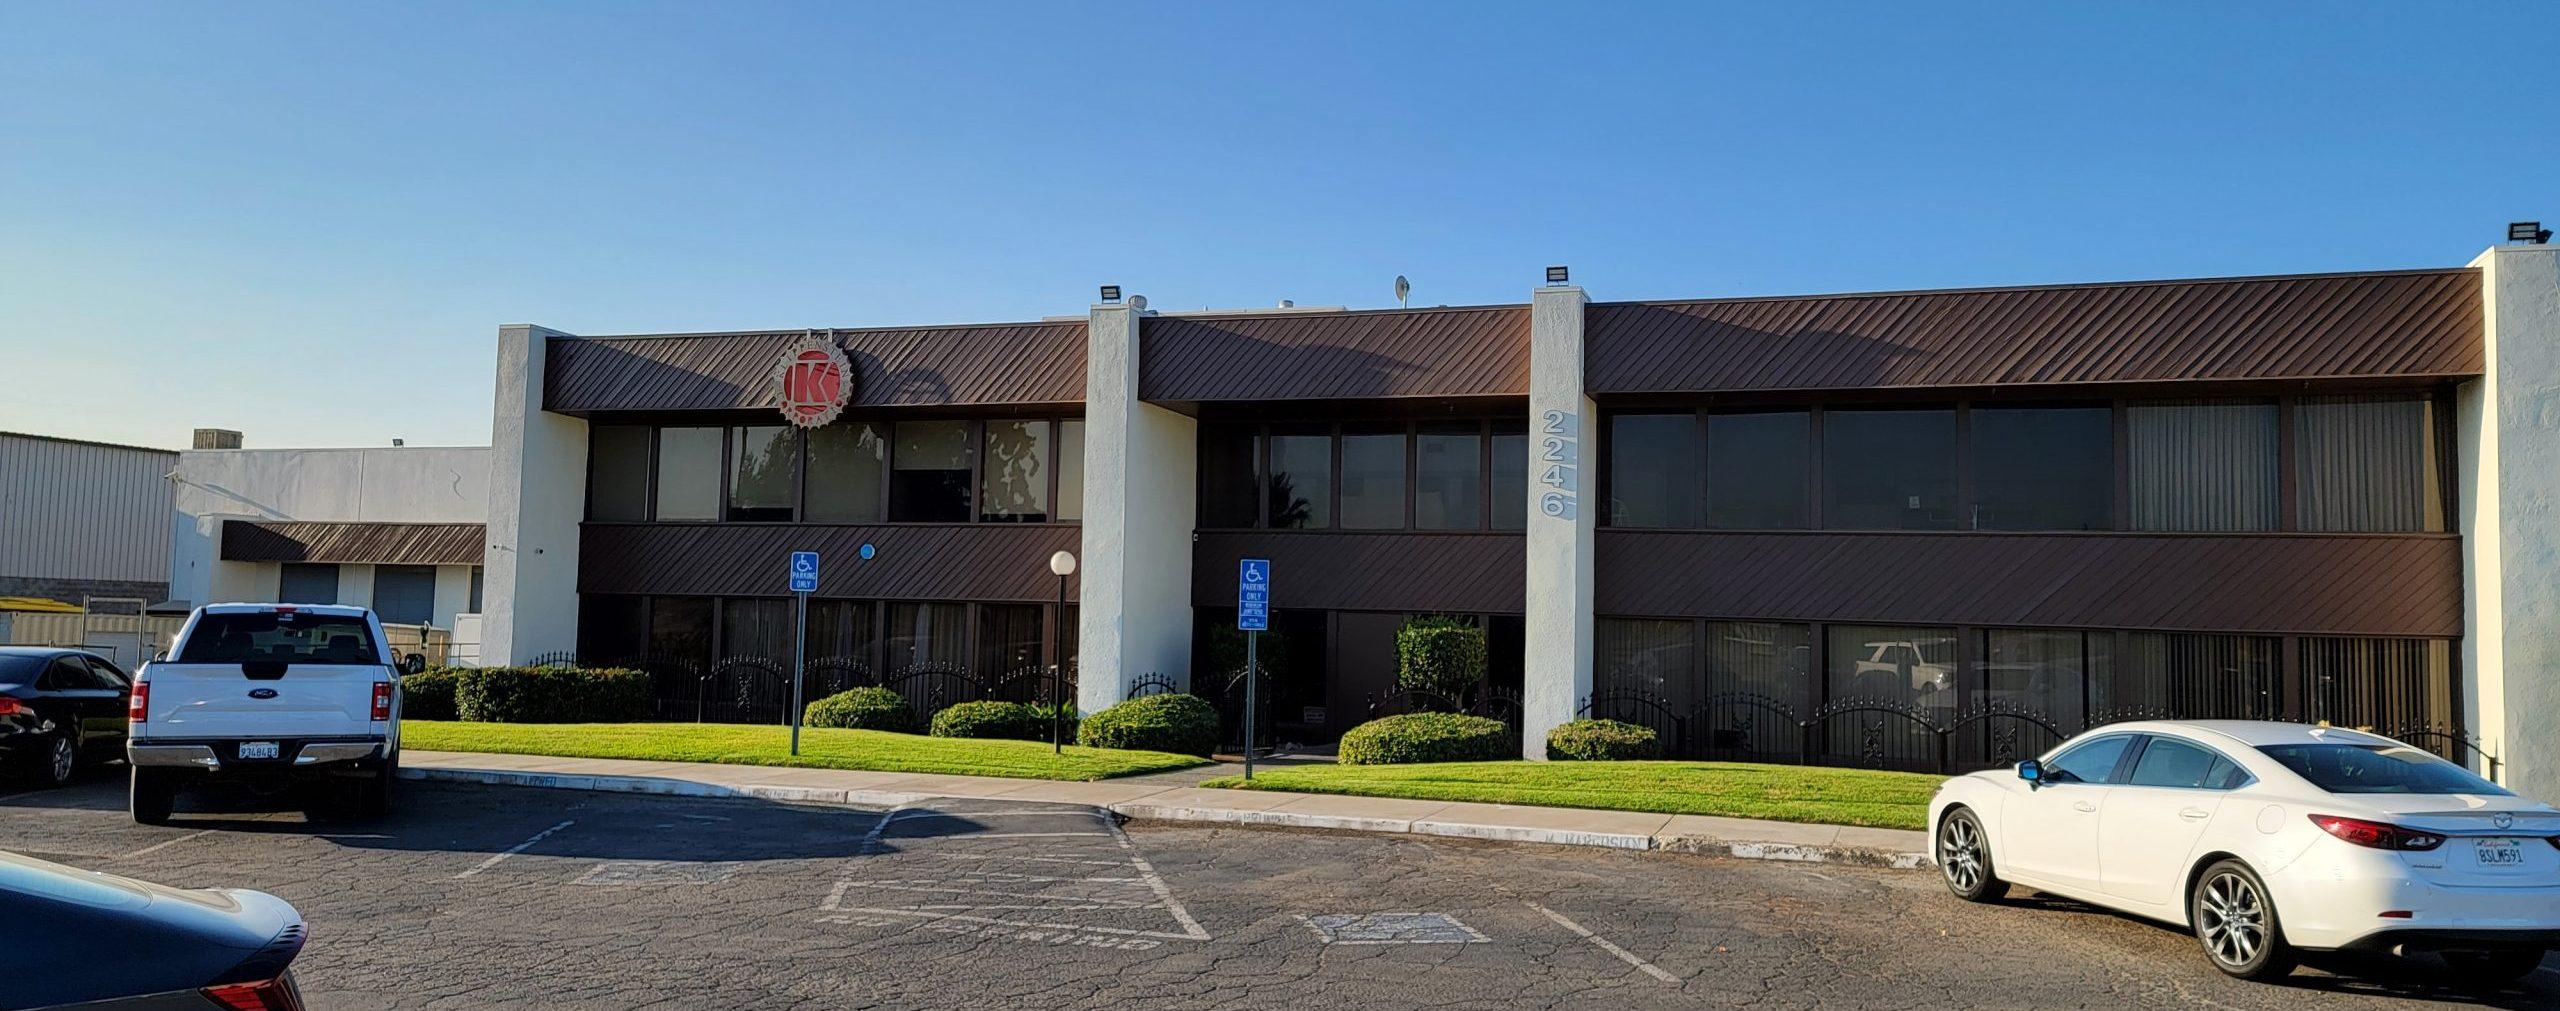 2246 E Date Ave, Fresno, CA 93706